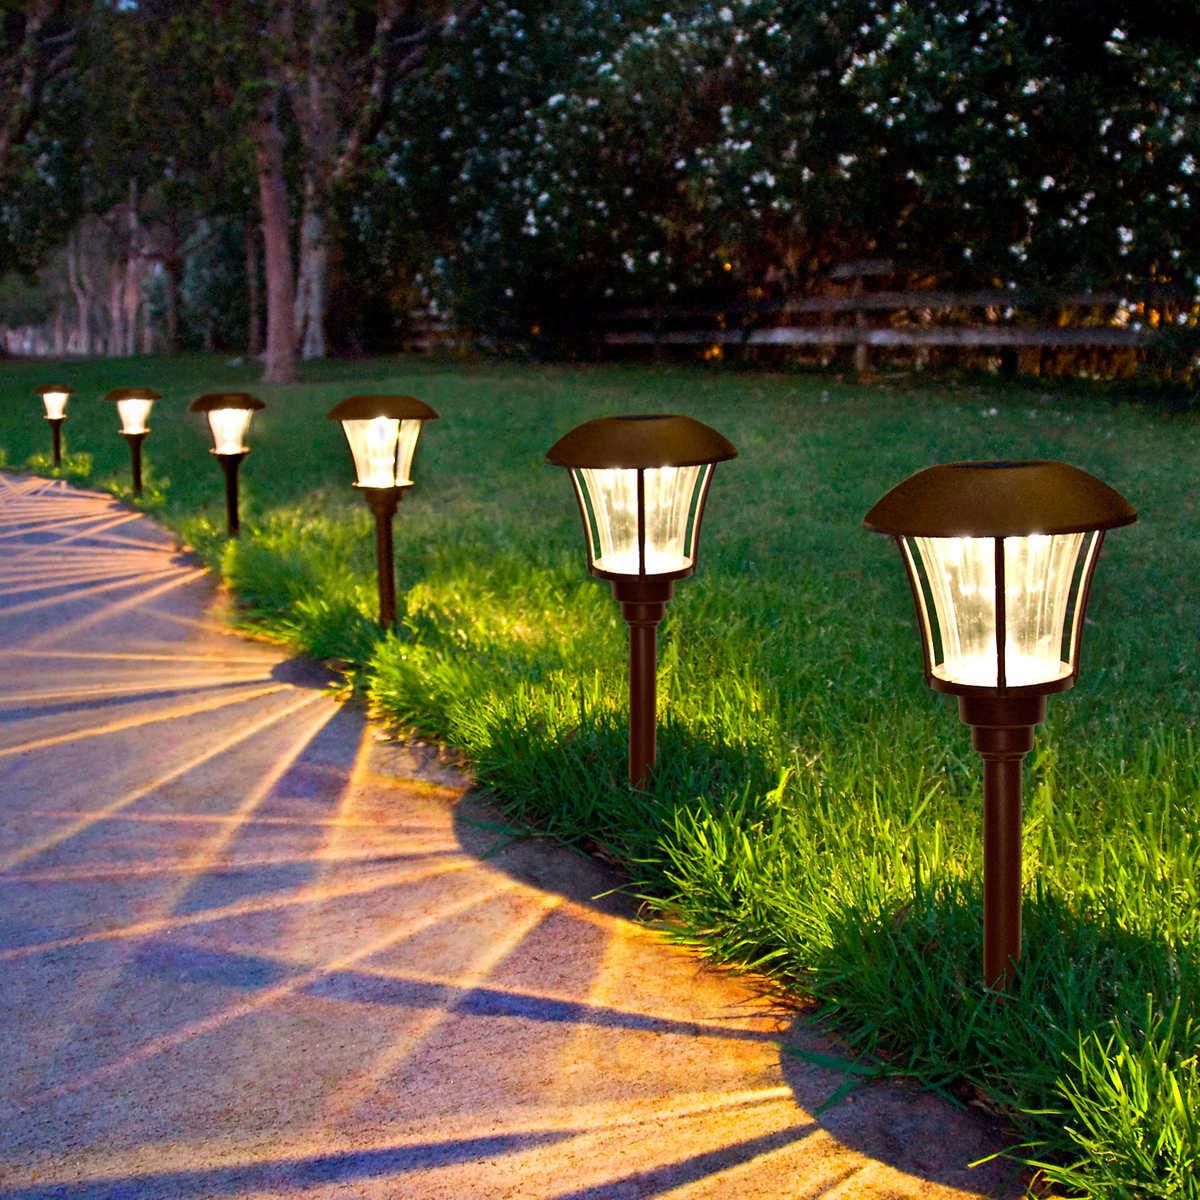 Solar patio lights costco - Smartyard Led Solar Pathway Lights 6 Pack